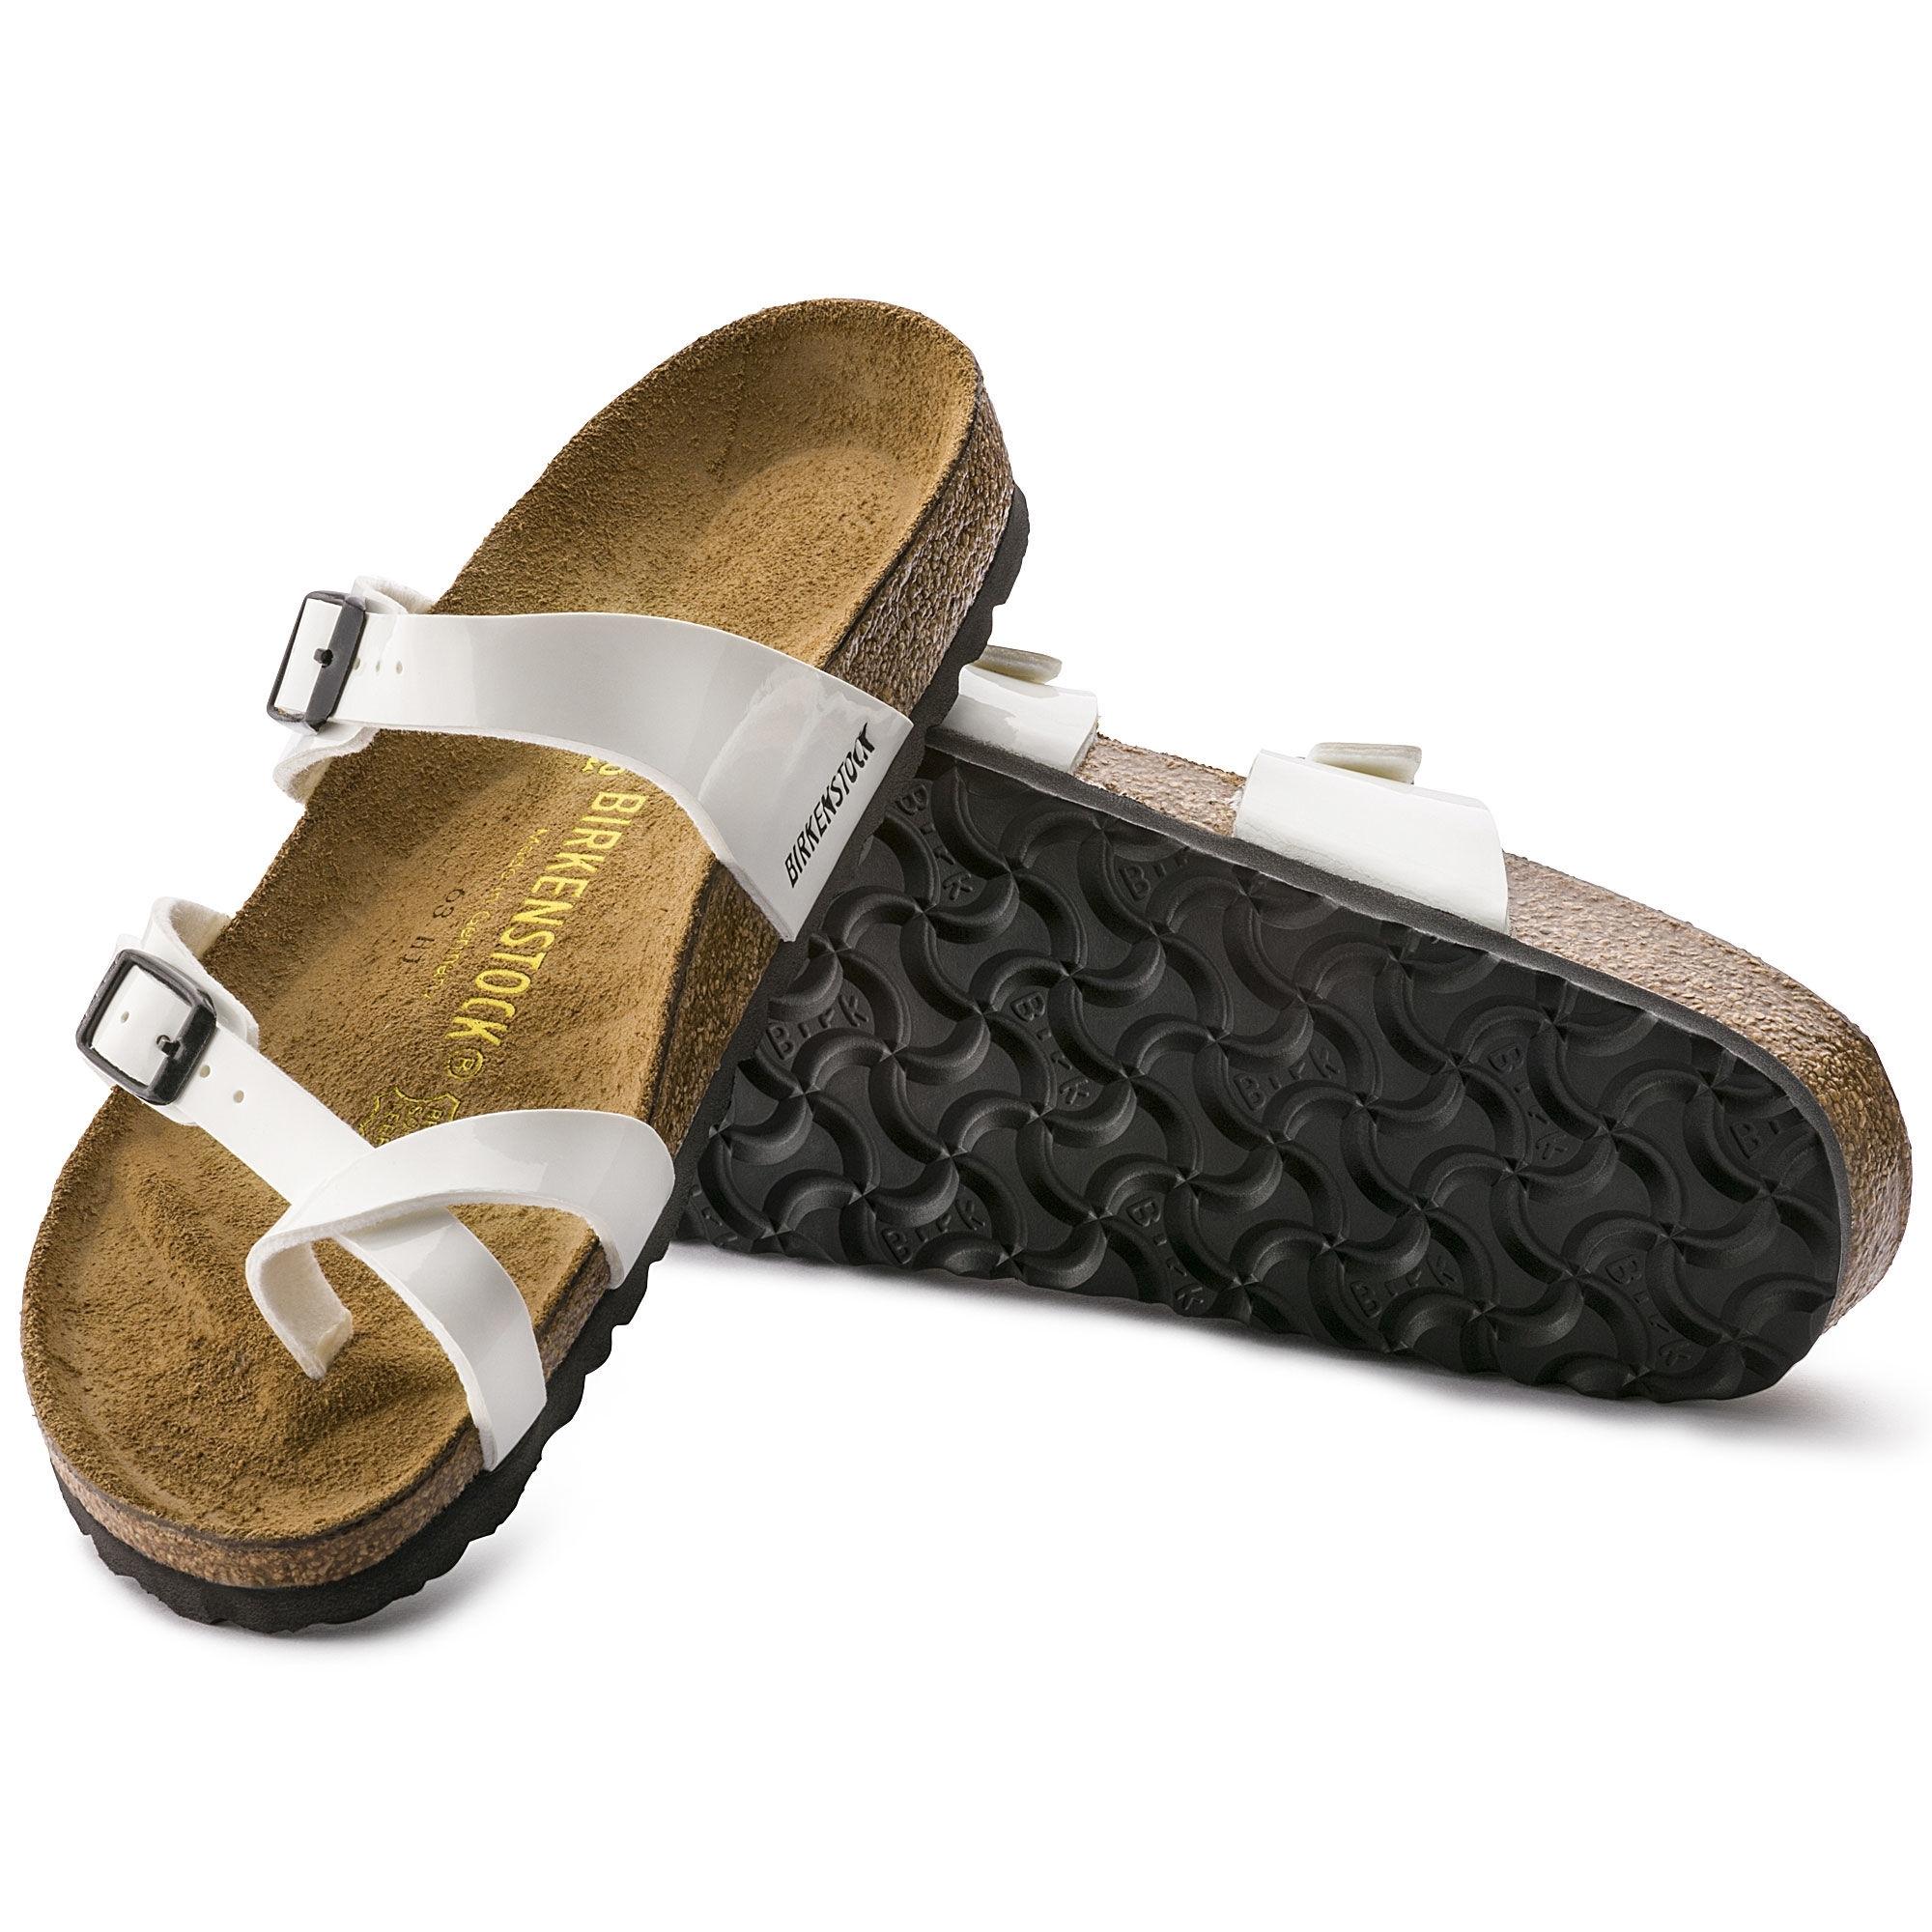 772d6d0fdedc Birkenstock MAYARI 71221 Ladies Cross Strap Sandals Patent White ...